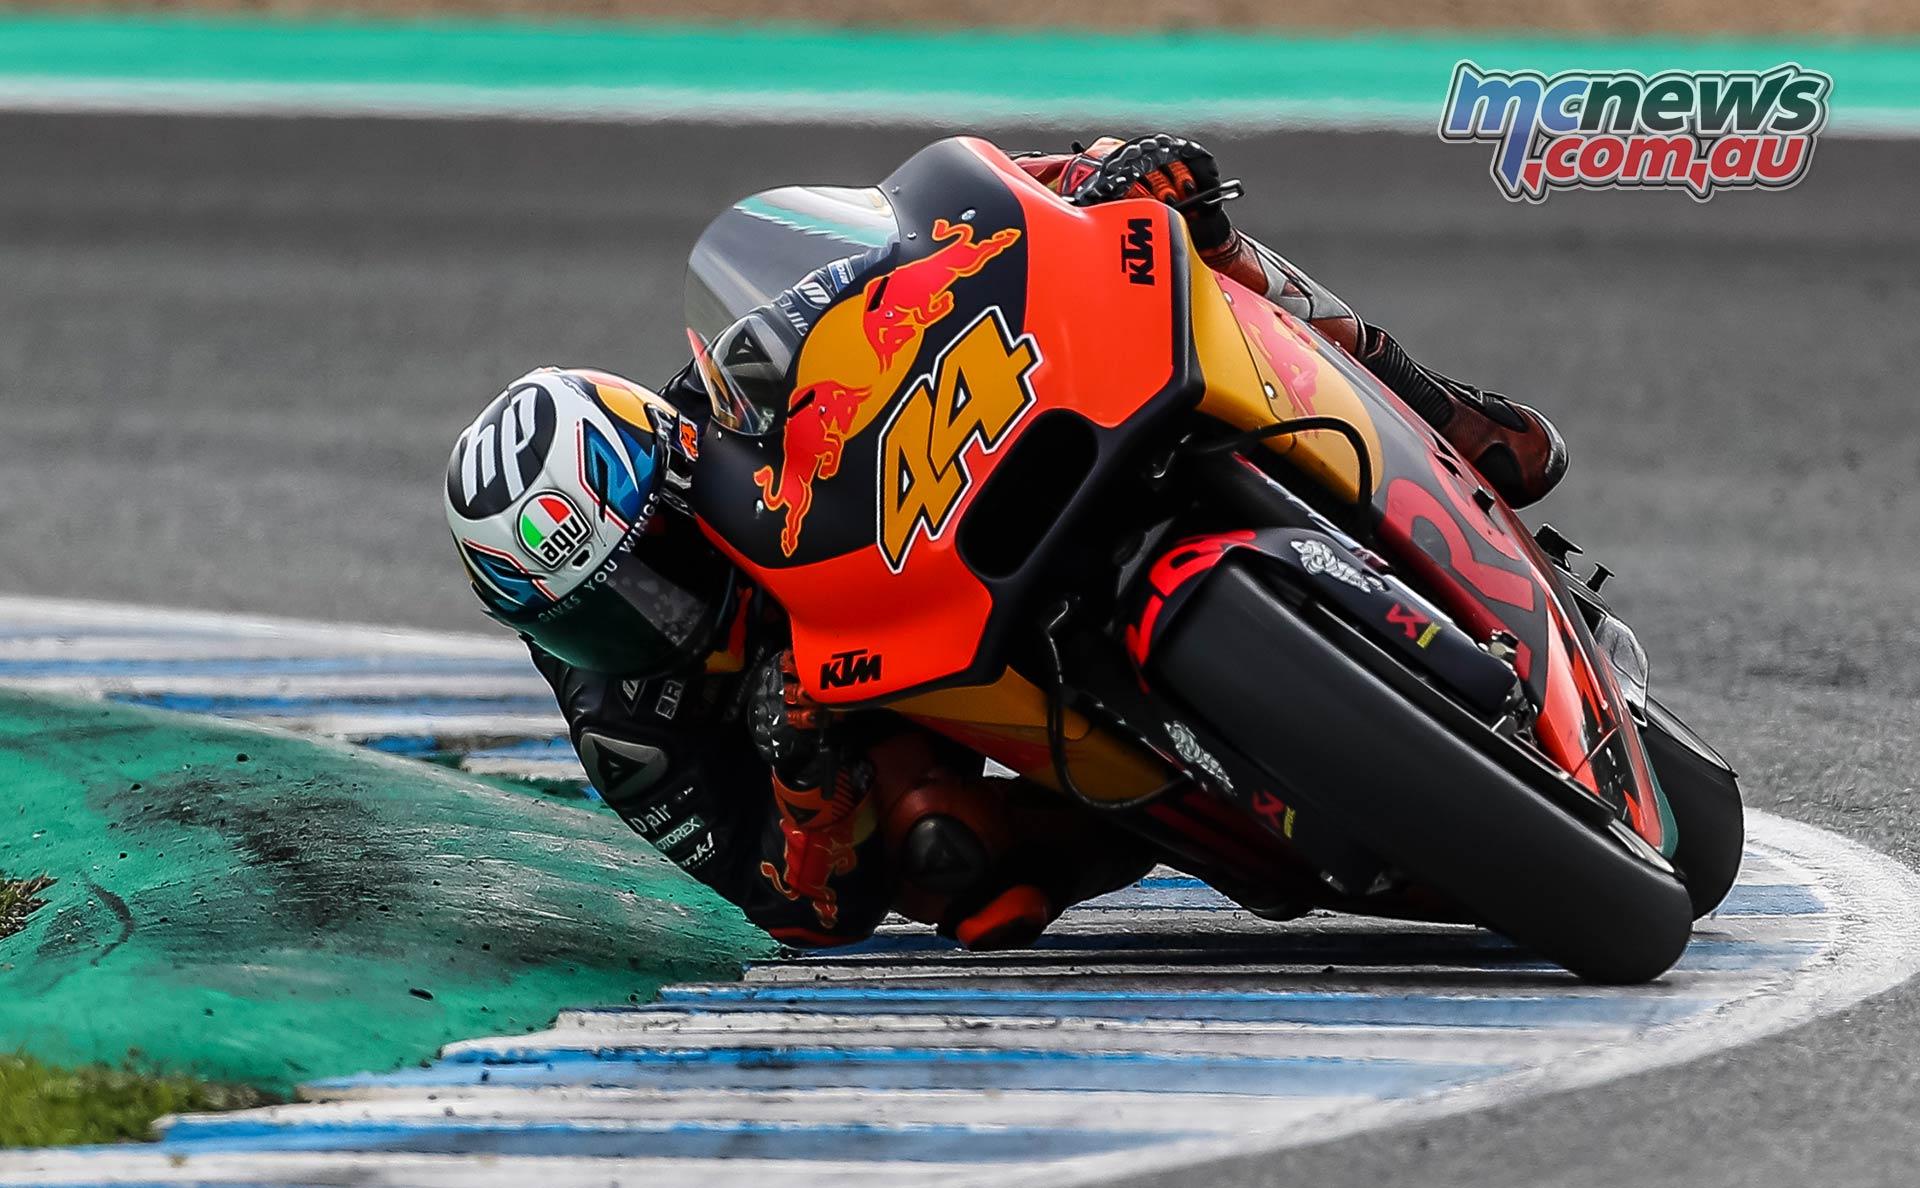 Takaaki Nakagami tops Jerez 2019 MotoGP pre-season test | MCNews.com.au